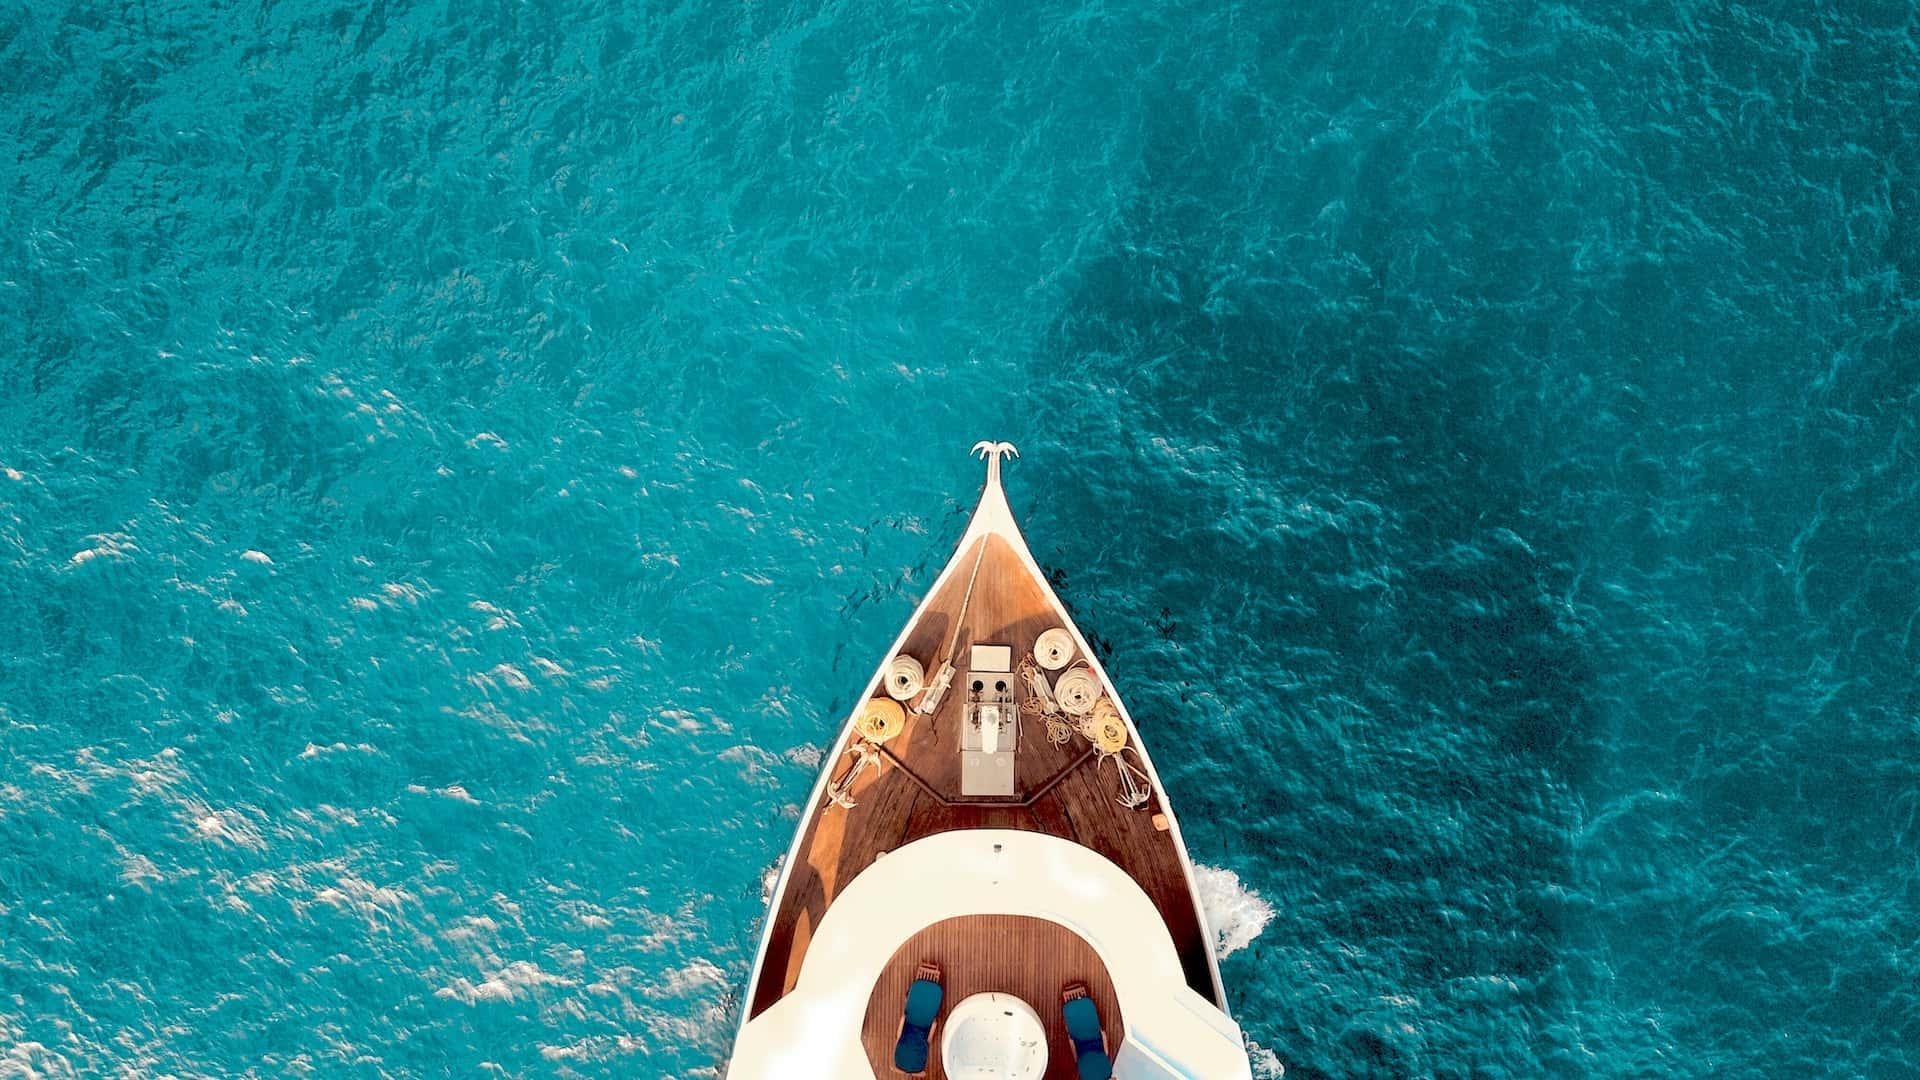 Maldives Boat, фото